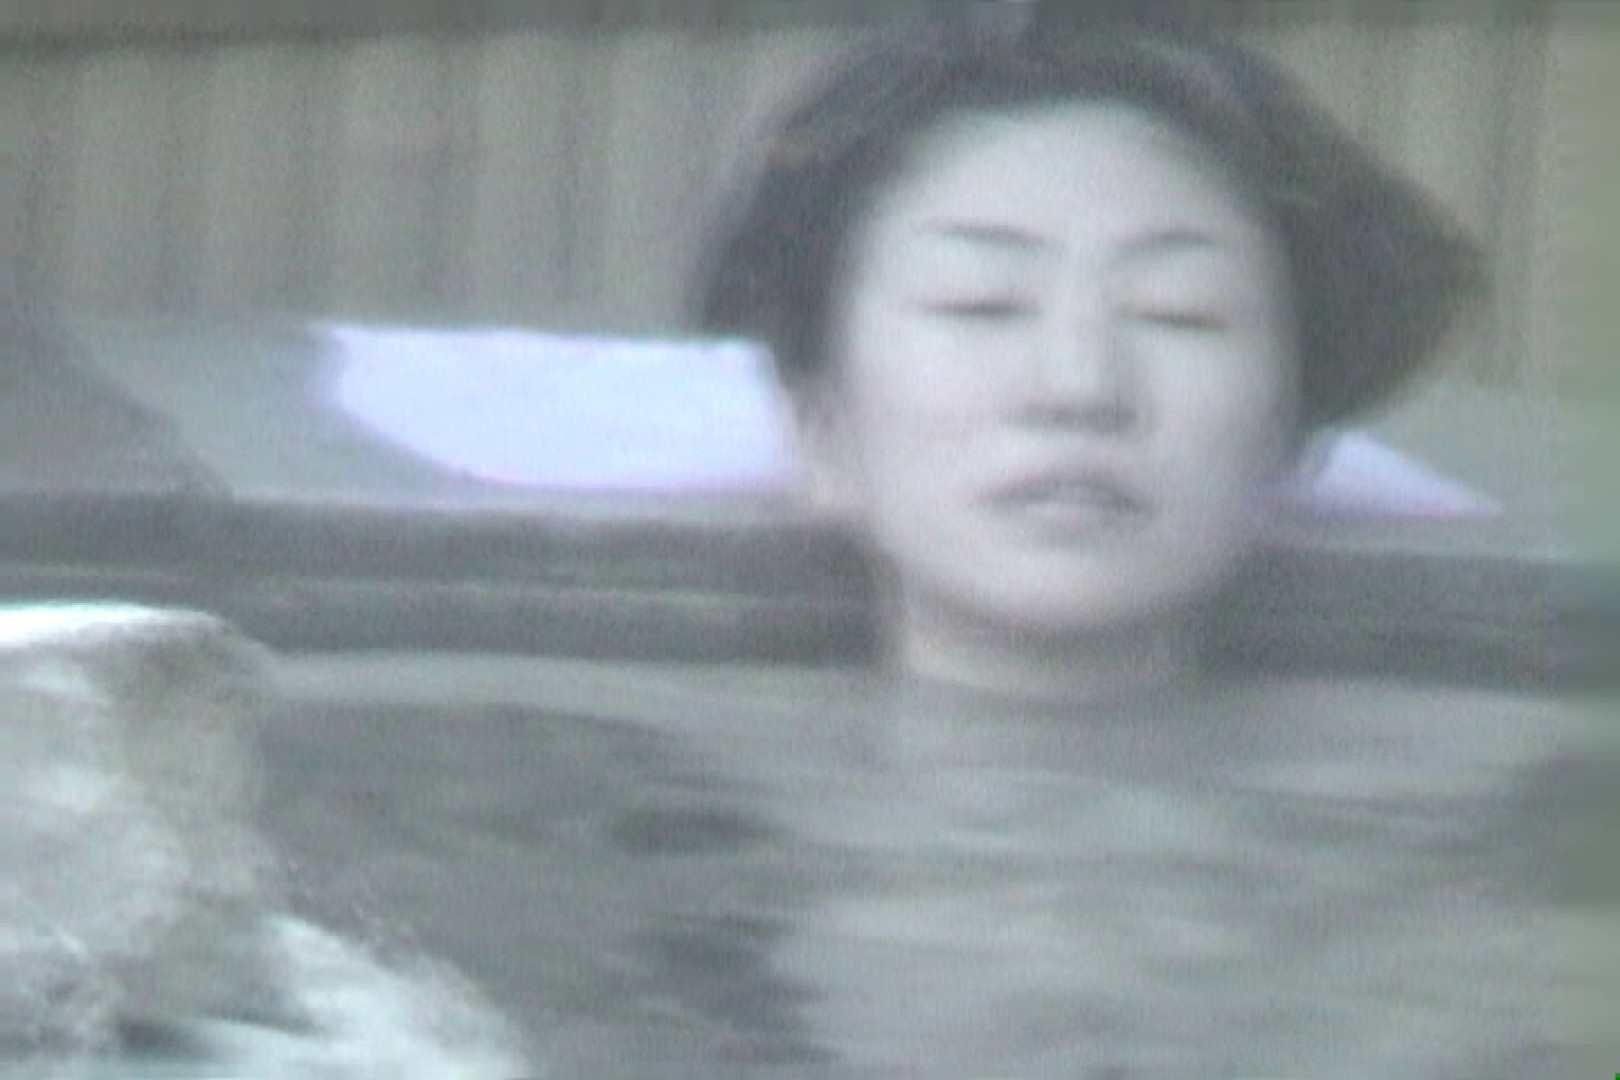 Aquaな露天風呂Vol.607 盗撮シリーズ | 露天風呂編  107PIX 97